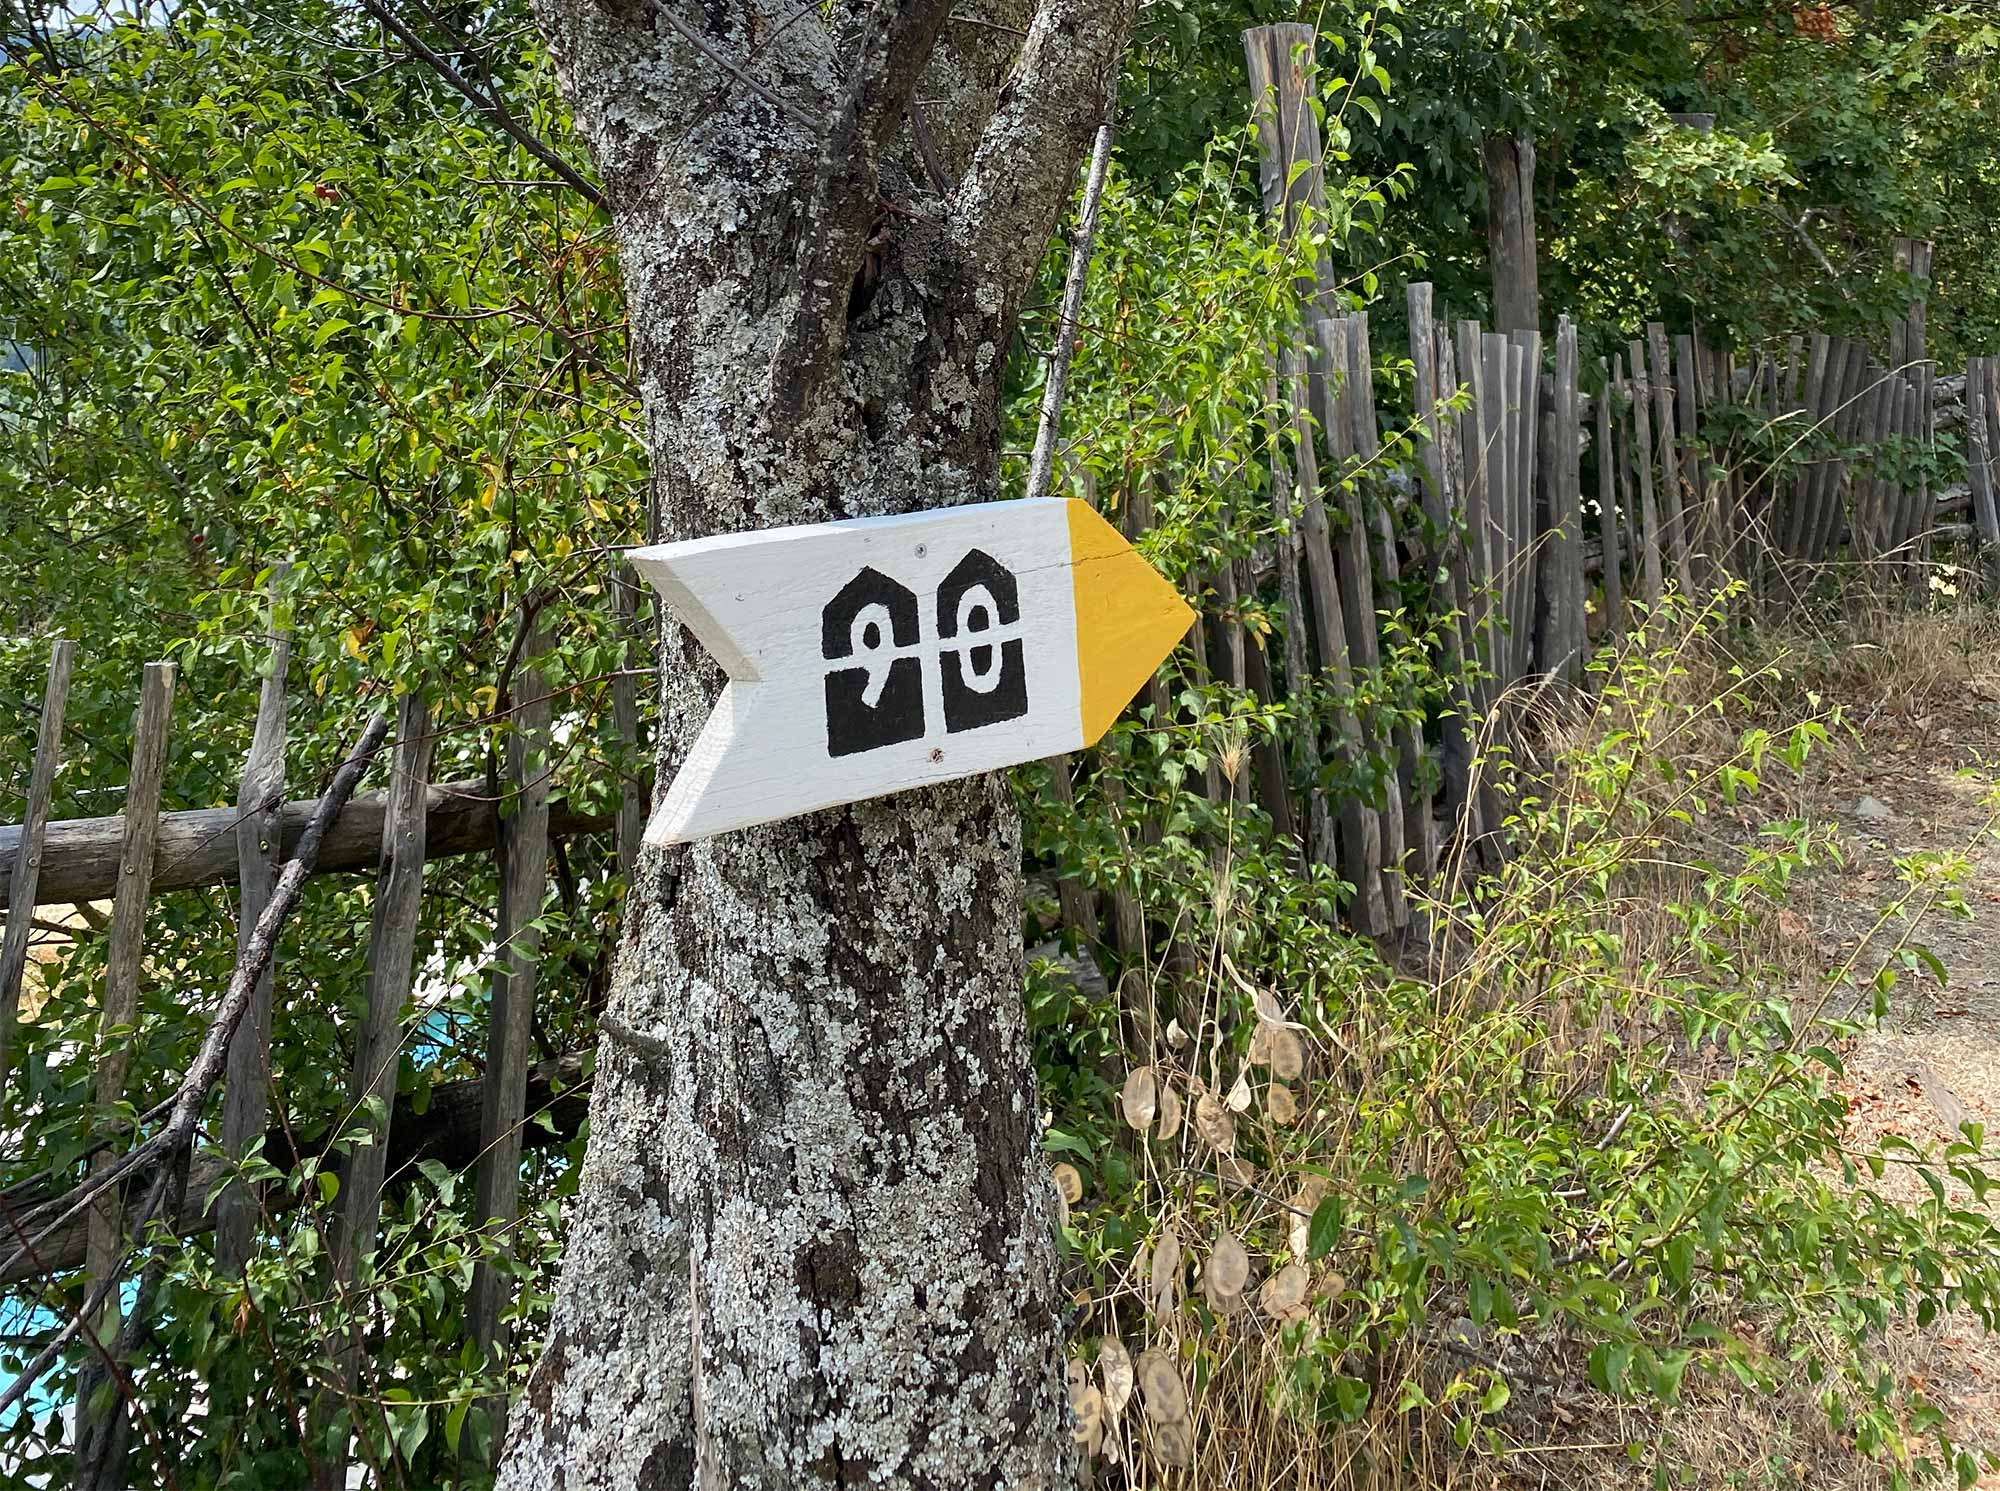 The way to Novanta